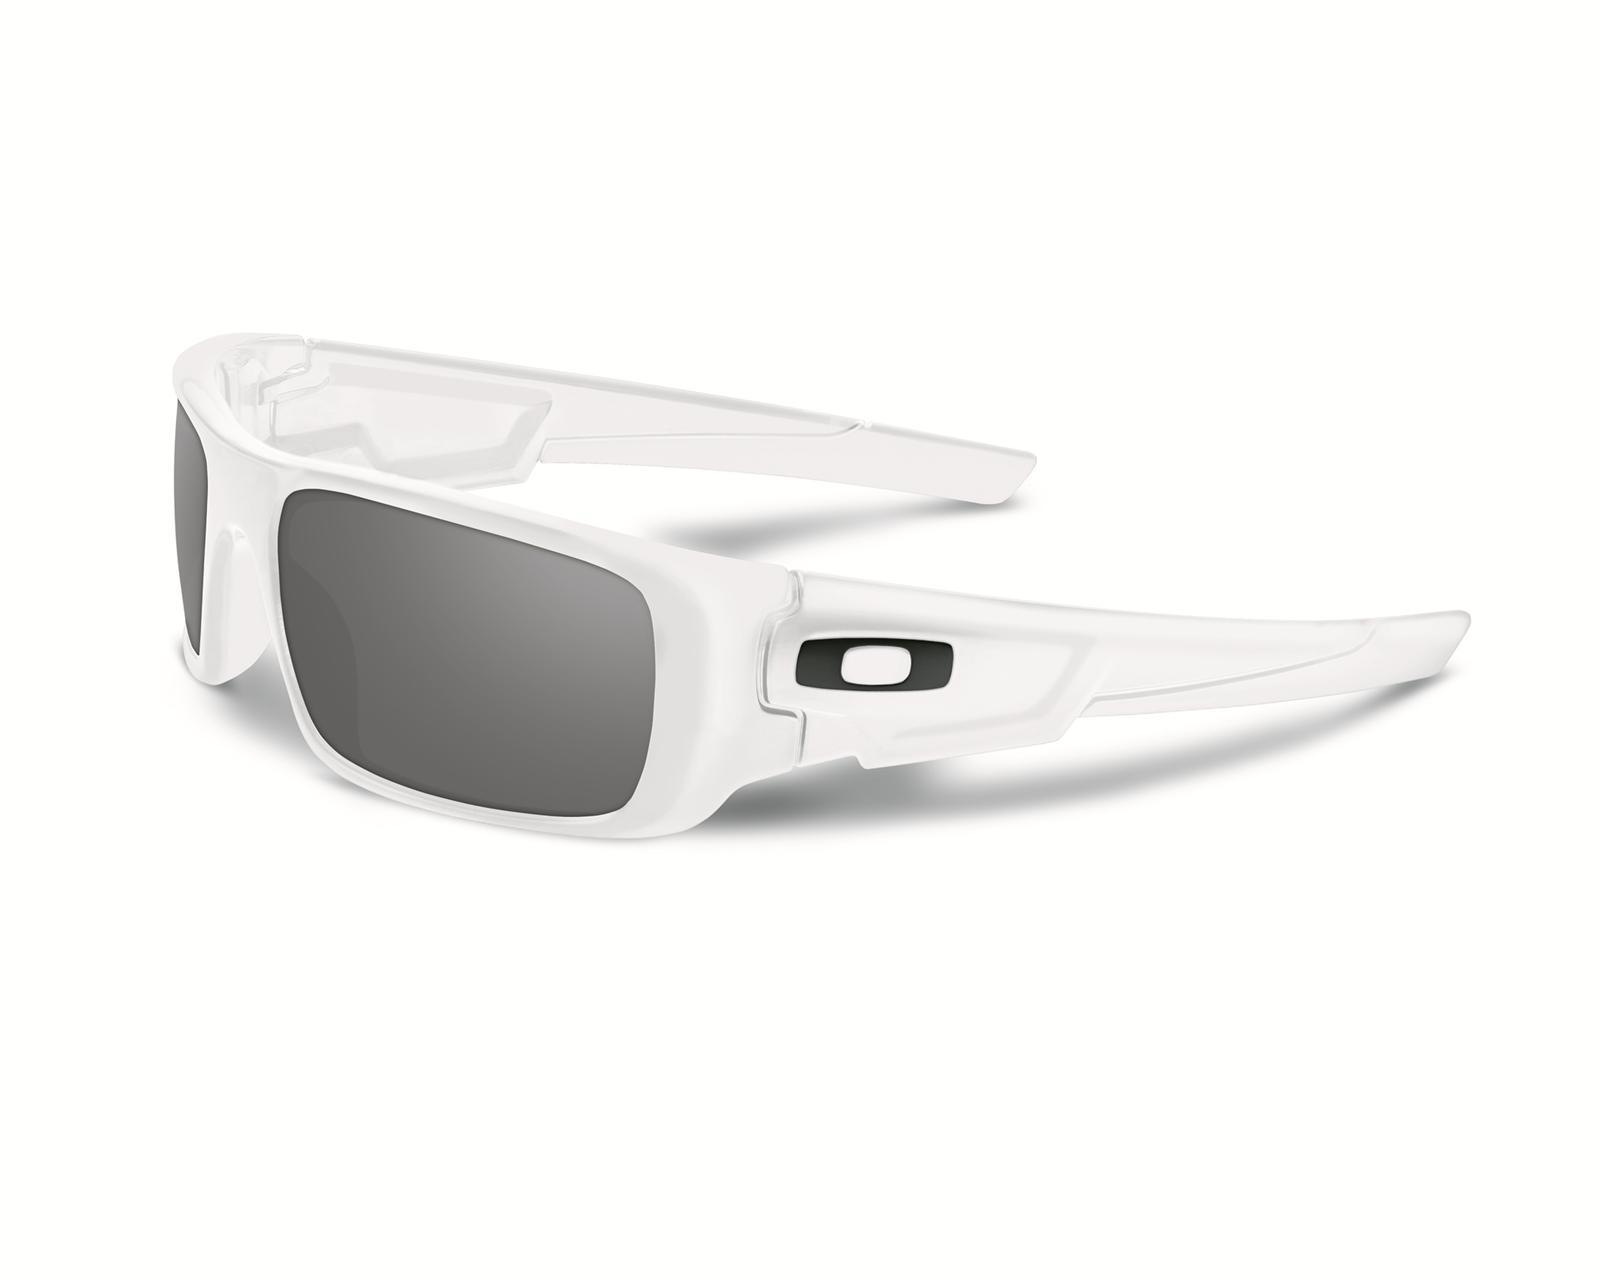 5f45b9e84c5 ... black chrome iridium  oakley crankshaft sunglasses oo9239 05 free  shipping on orders over 99 at summit racing